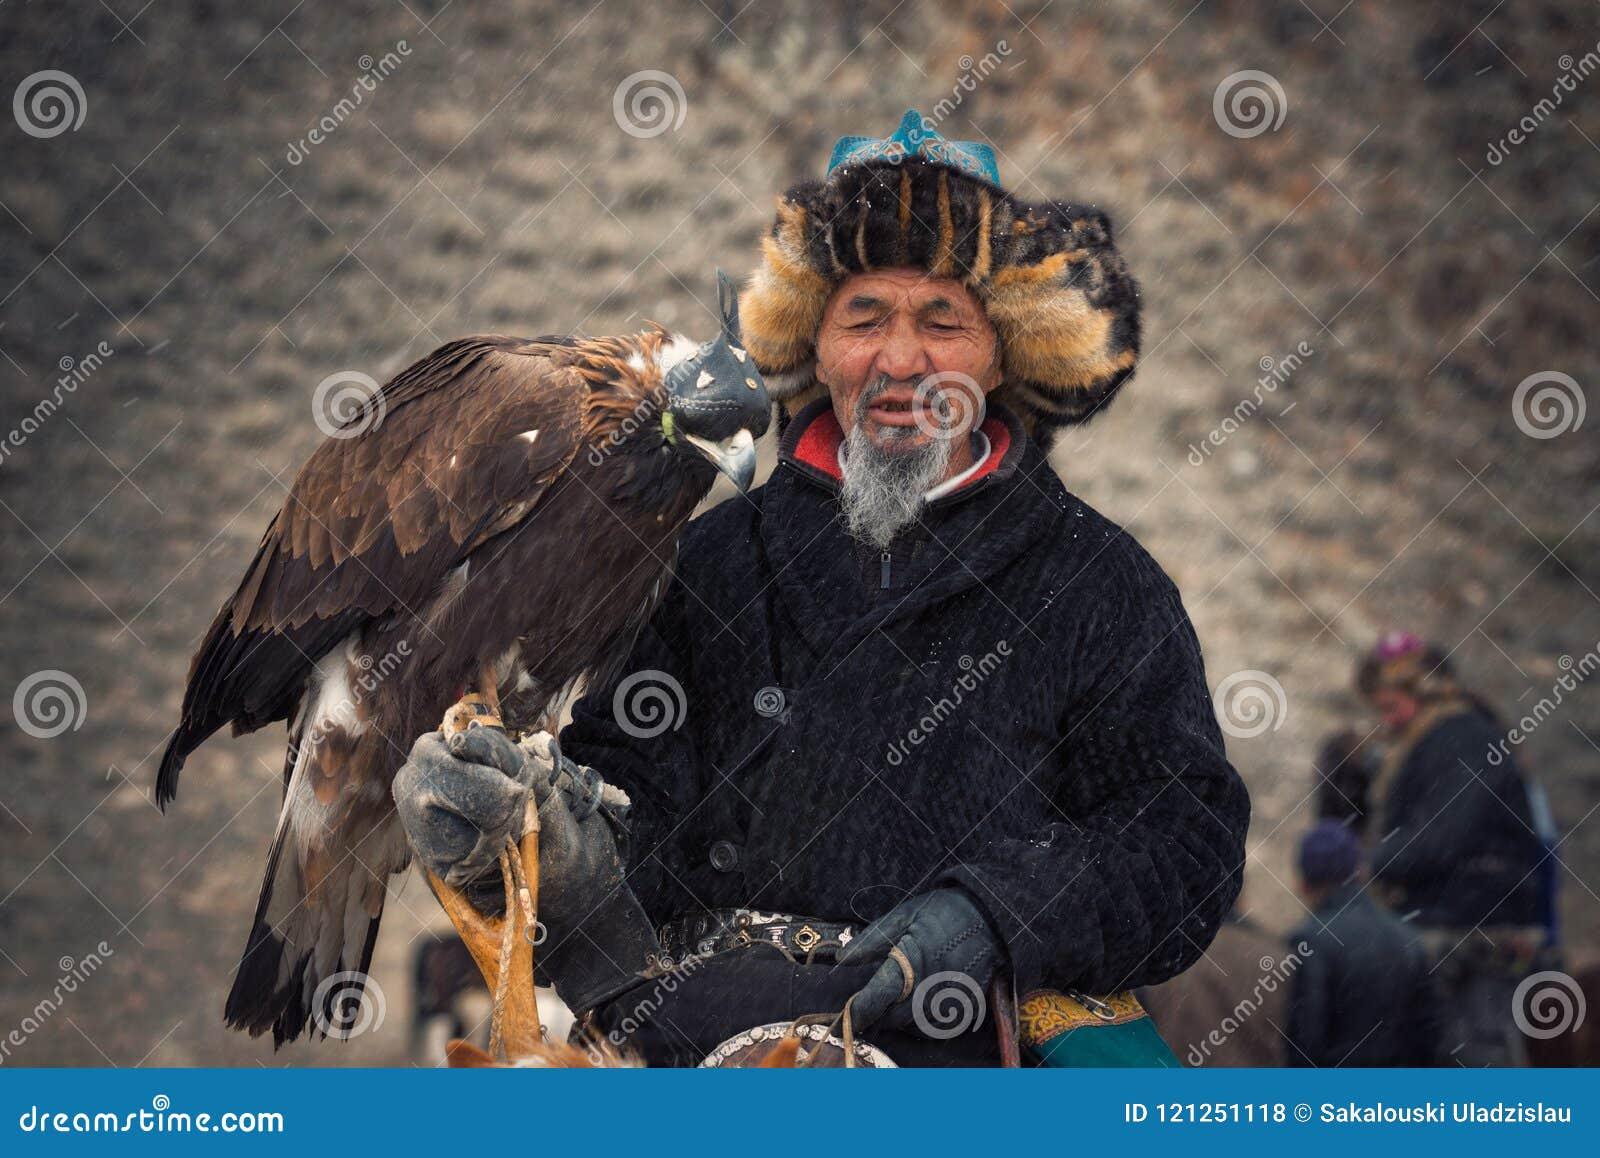 Bayan-Olgii Mongoliet - Oktober 01, 2017: Guld- Eagle Festifal Stående av pittoreska gamla Greybearded mongoliska Hunter Berkutch